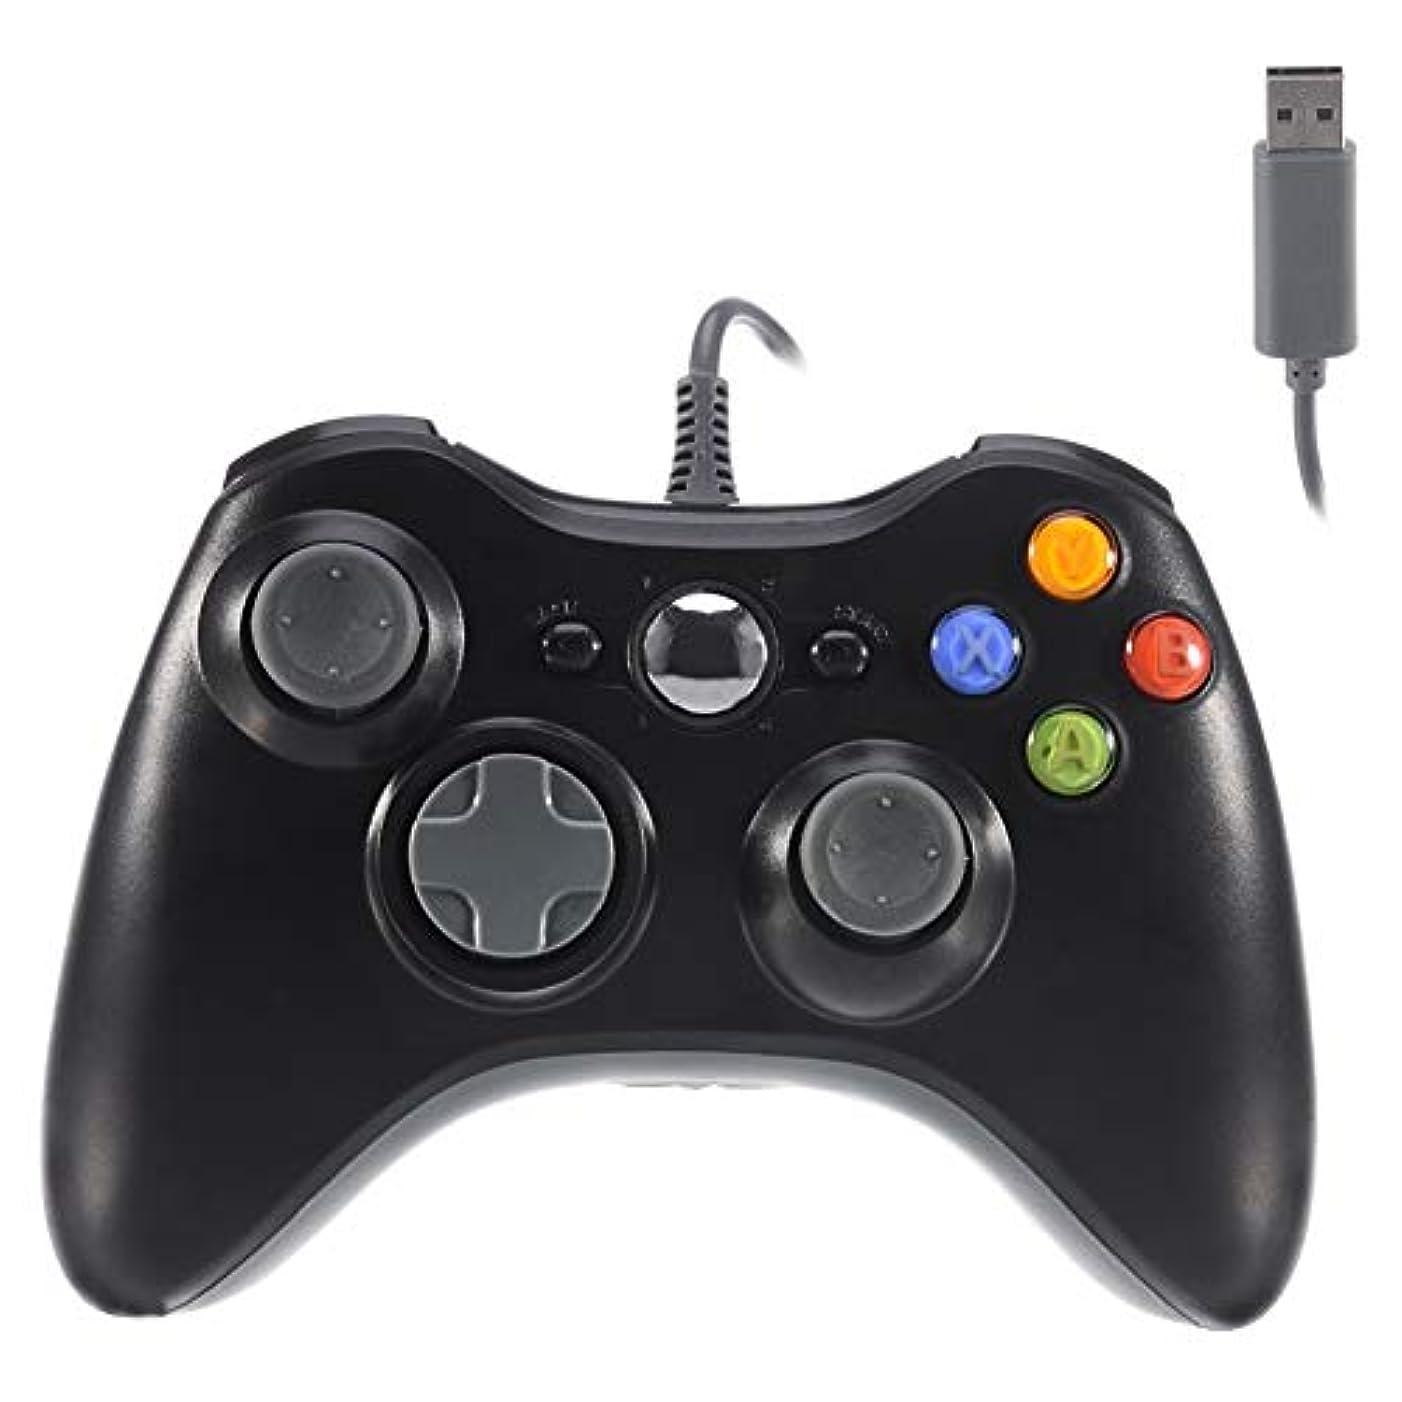 VOYEE Xbox 360 Controller,USB Wired Controller Gamepad for Microsoft Xbox 360,PC Windowns,XP,Vista,Win7 (Black)